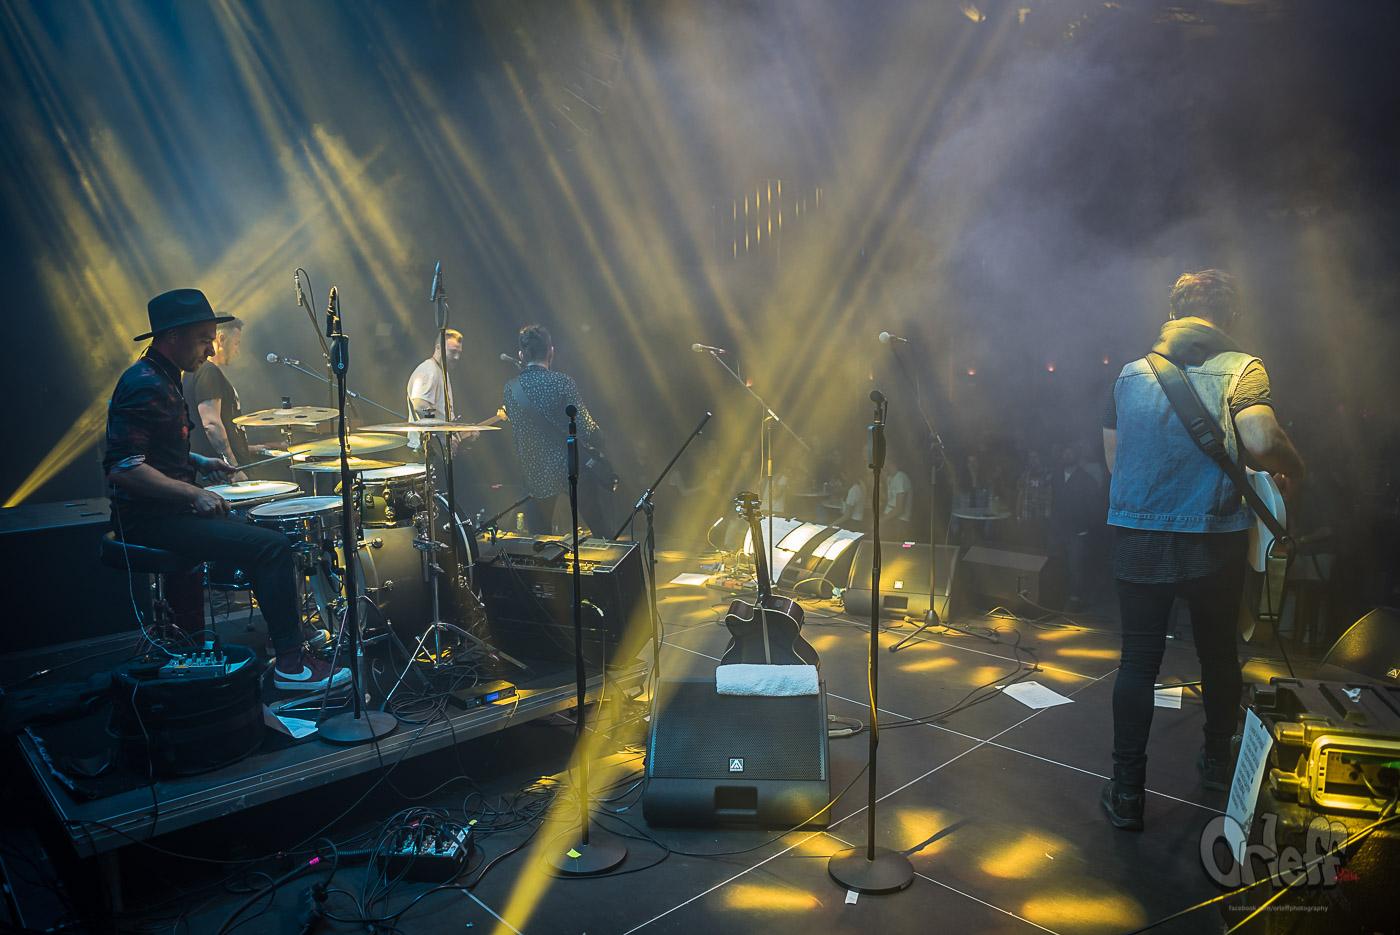 Jeremy? & Kiril Marichkov @ Music Jam, 2019